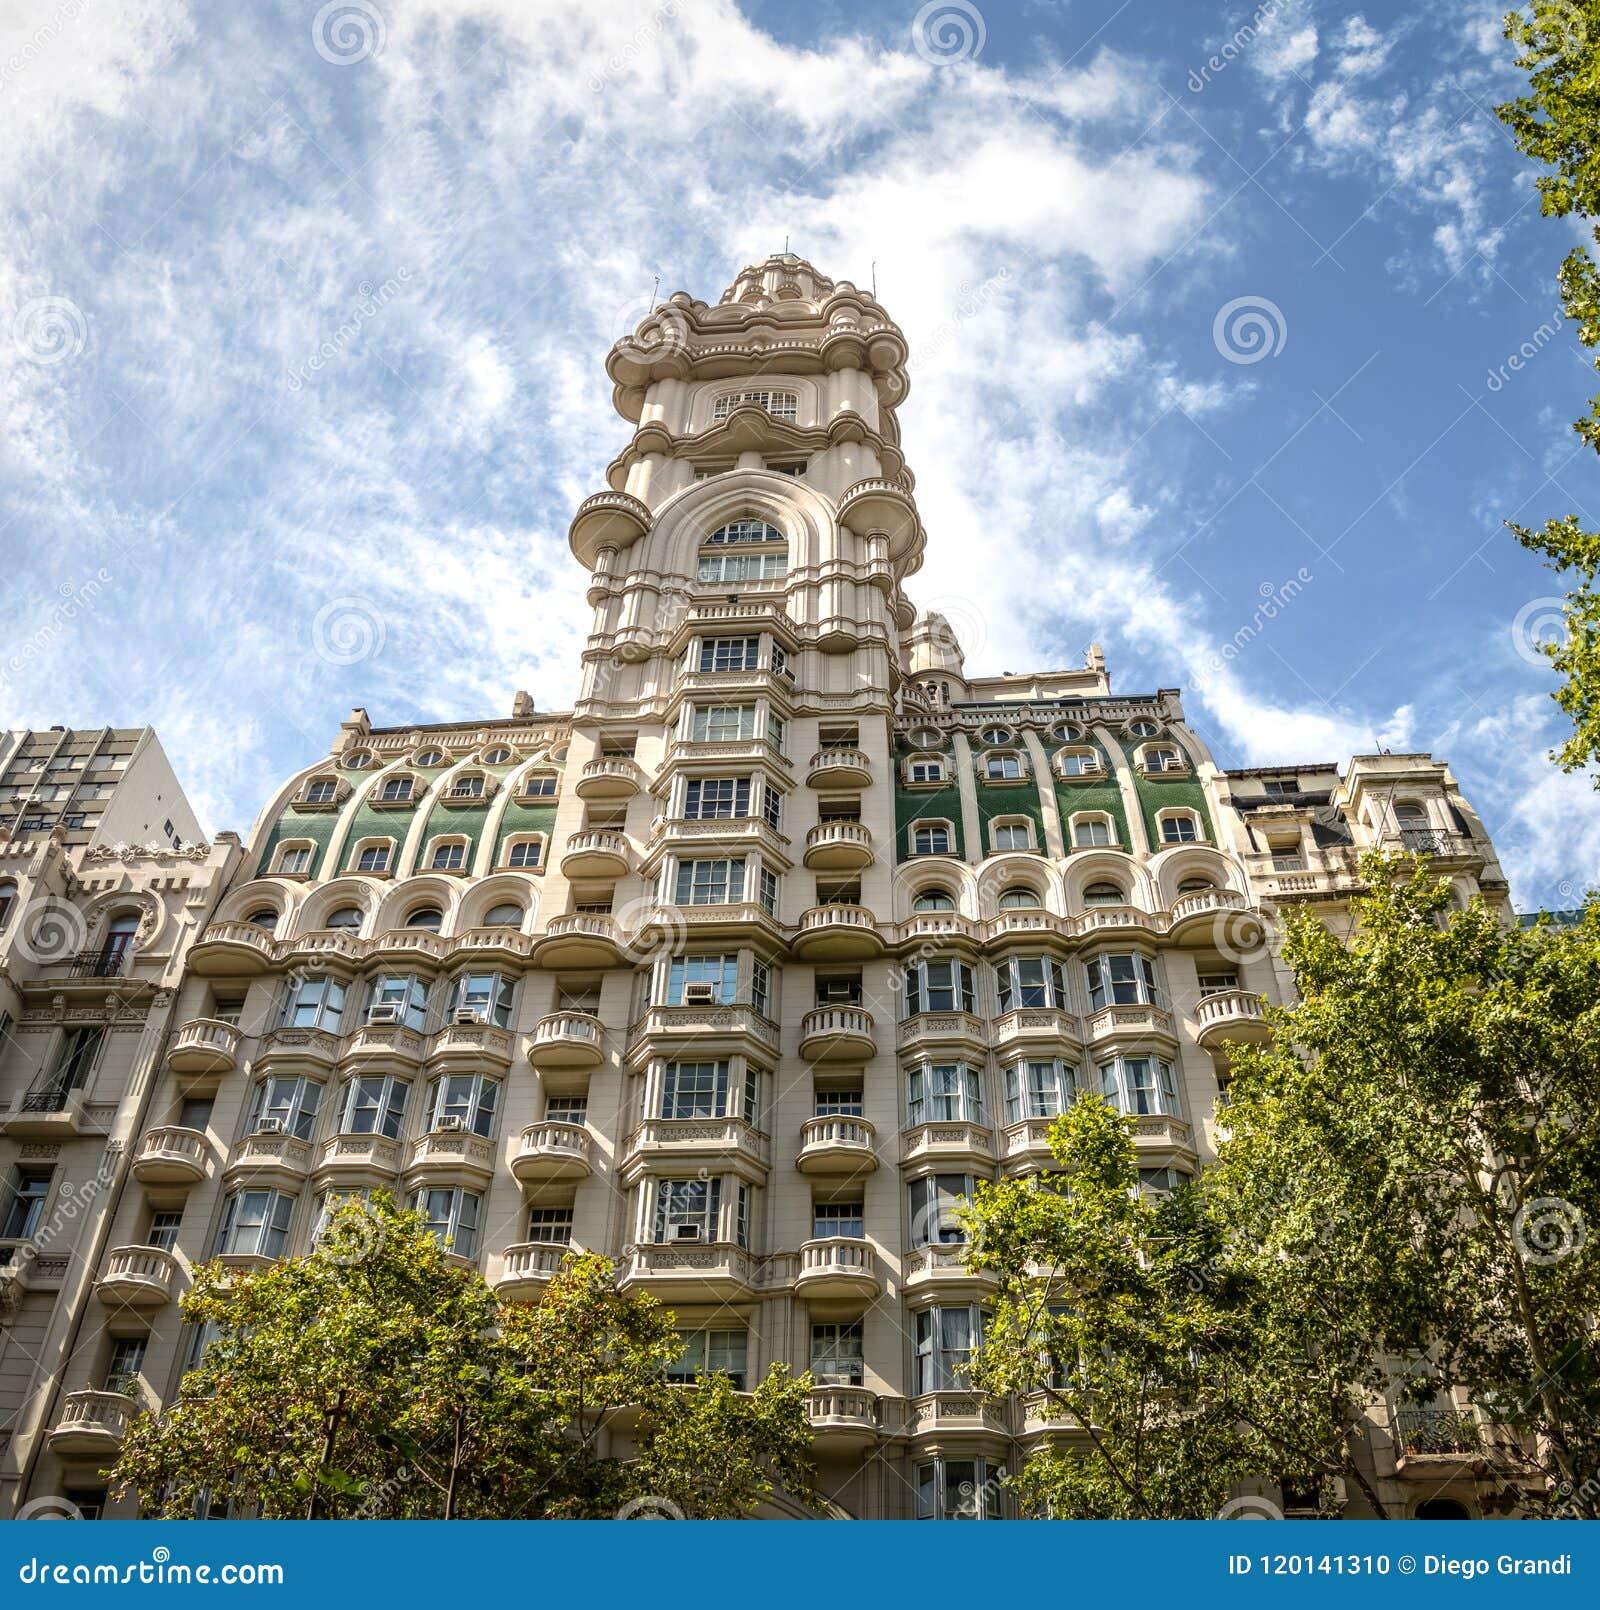 Barolo Palace building - Buenos Aires, Argentina